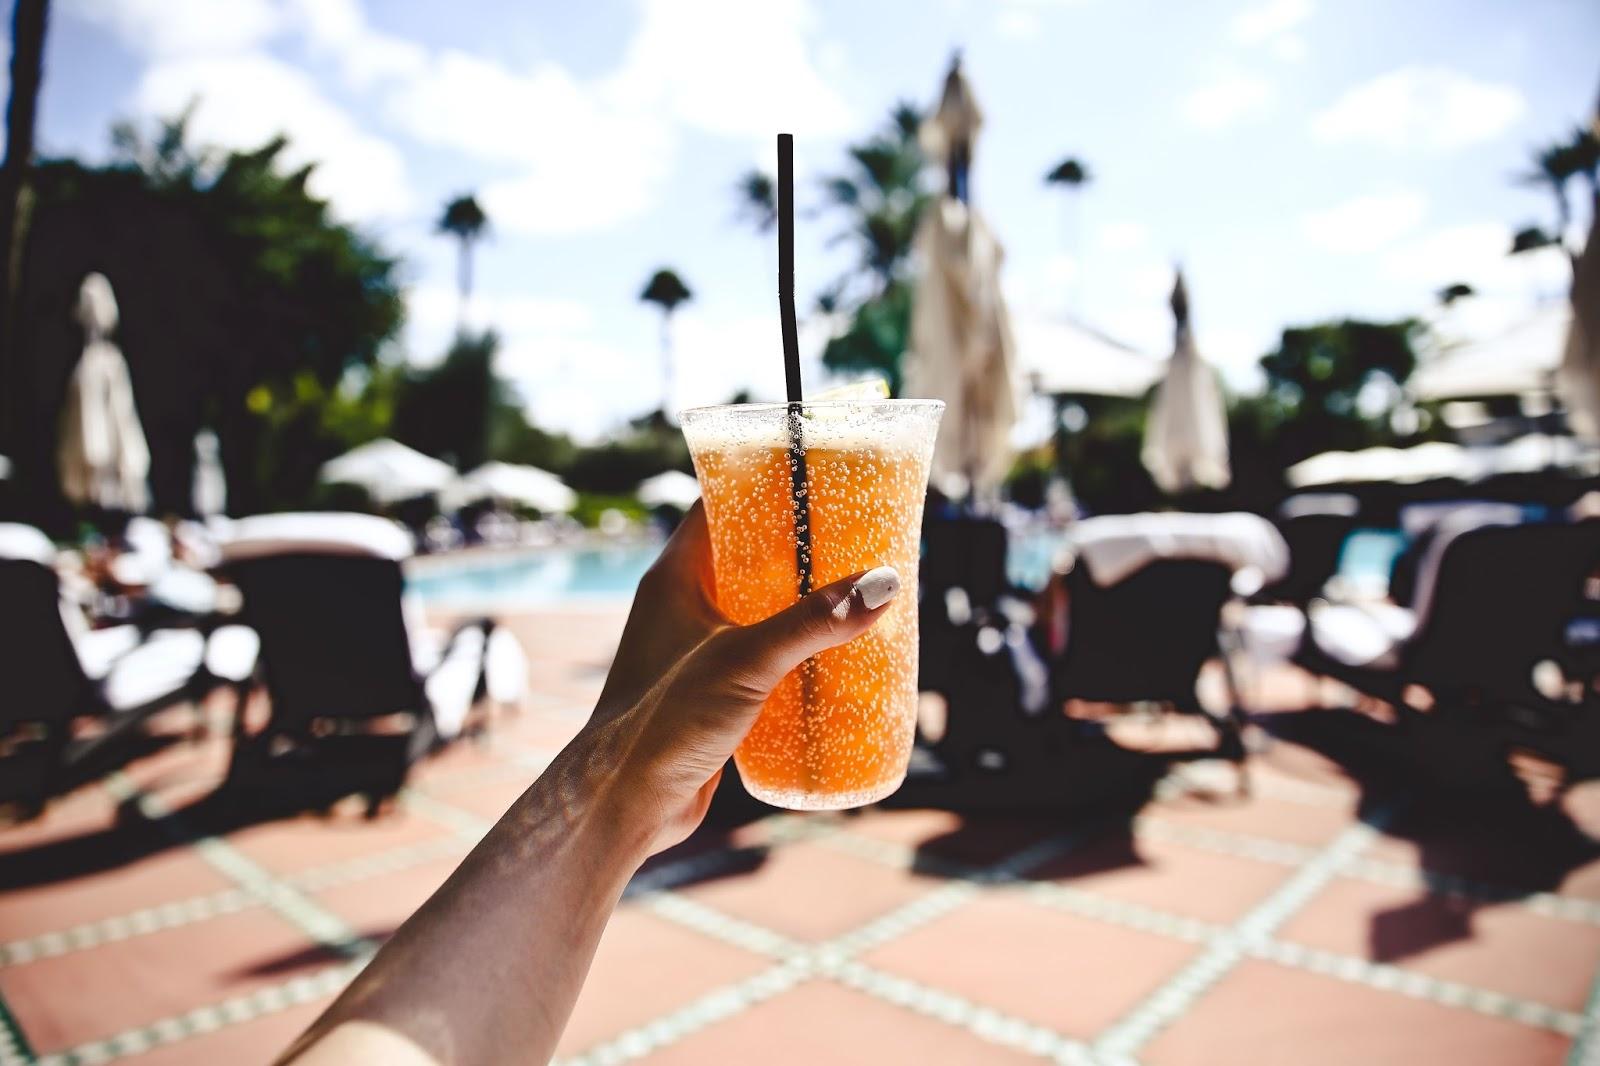 La Mamounia, La Mamounia blog, La mamounia Marrakech, la mamounia hotel review, trip, travel, luxury stay